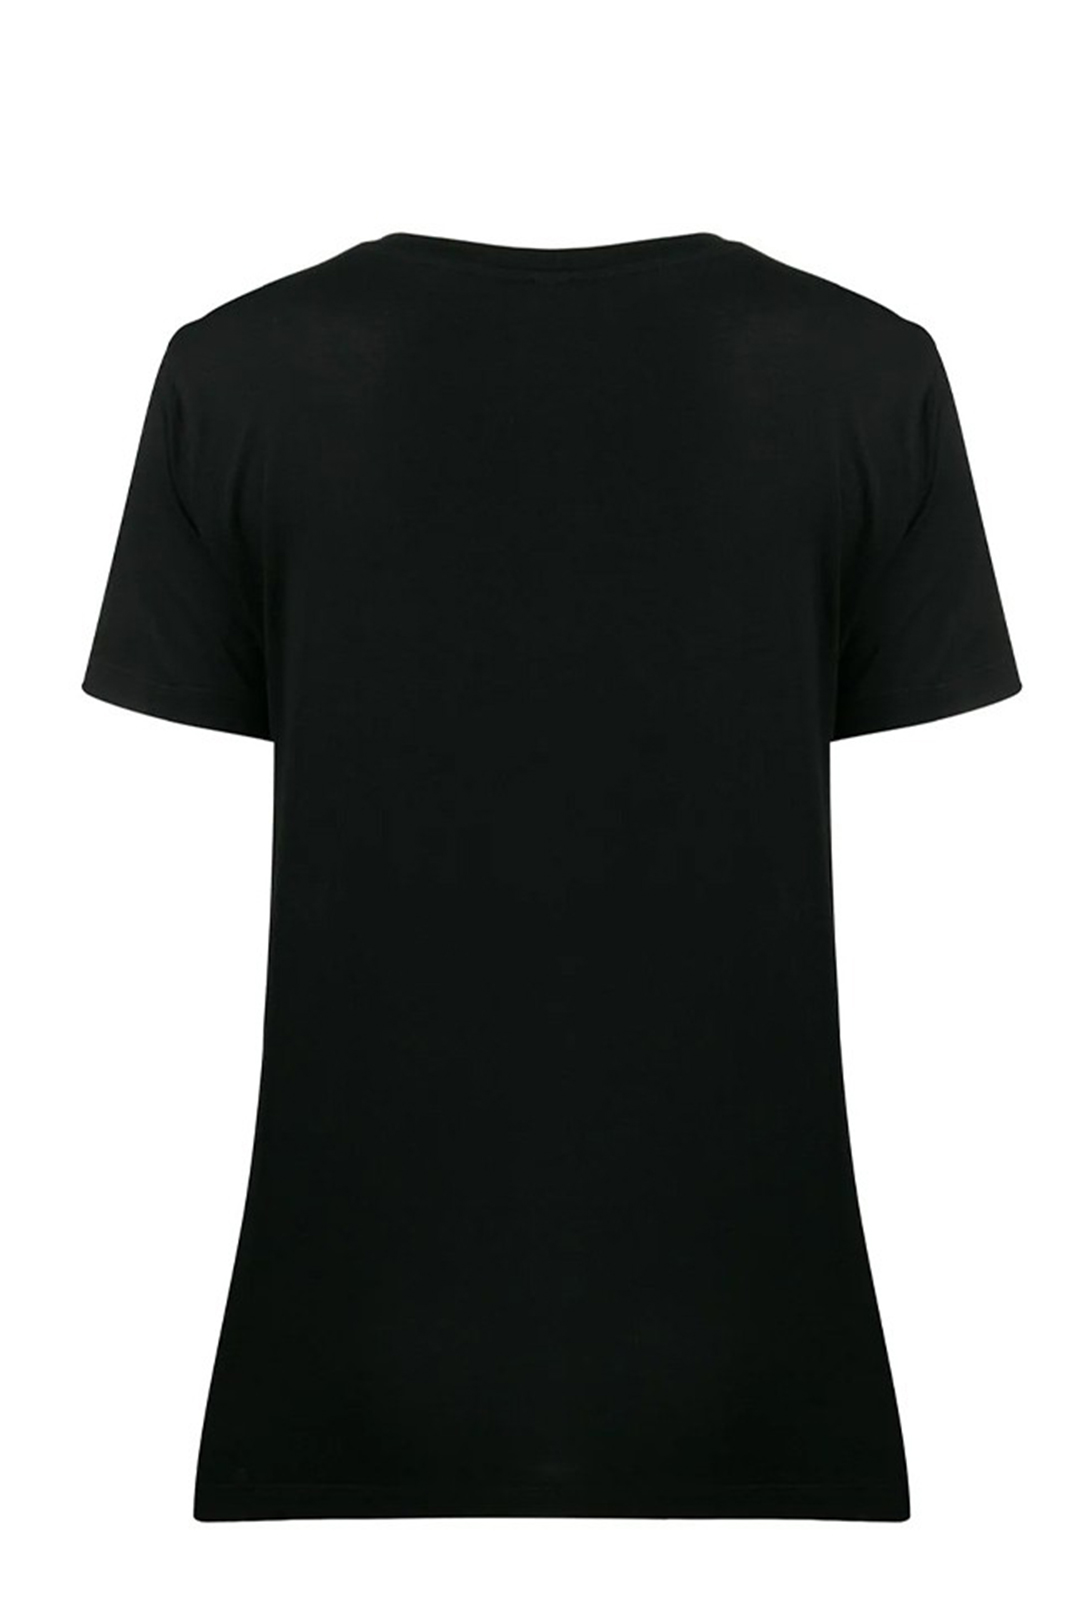 Tee shirt  Emporio armani 164141 9A255 020 BLACK